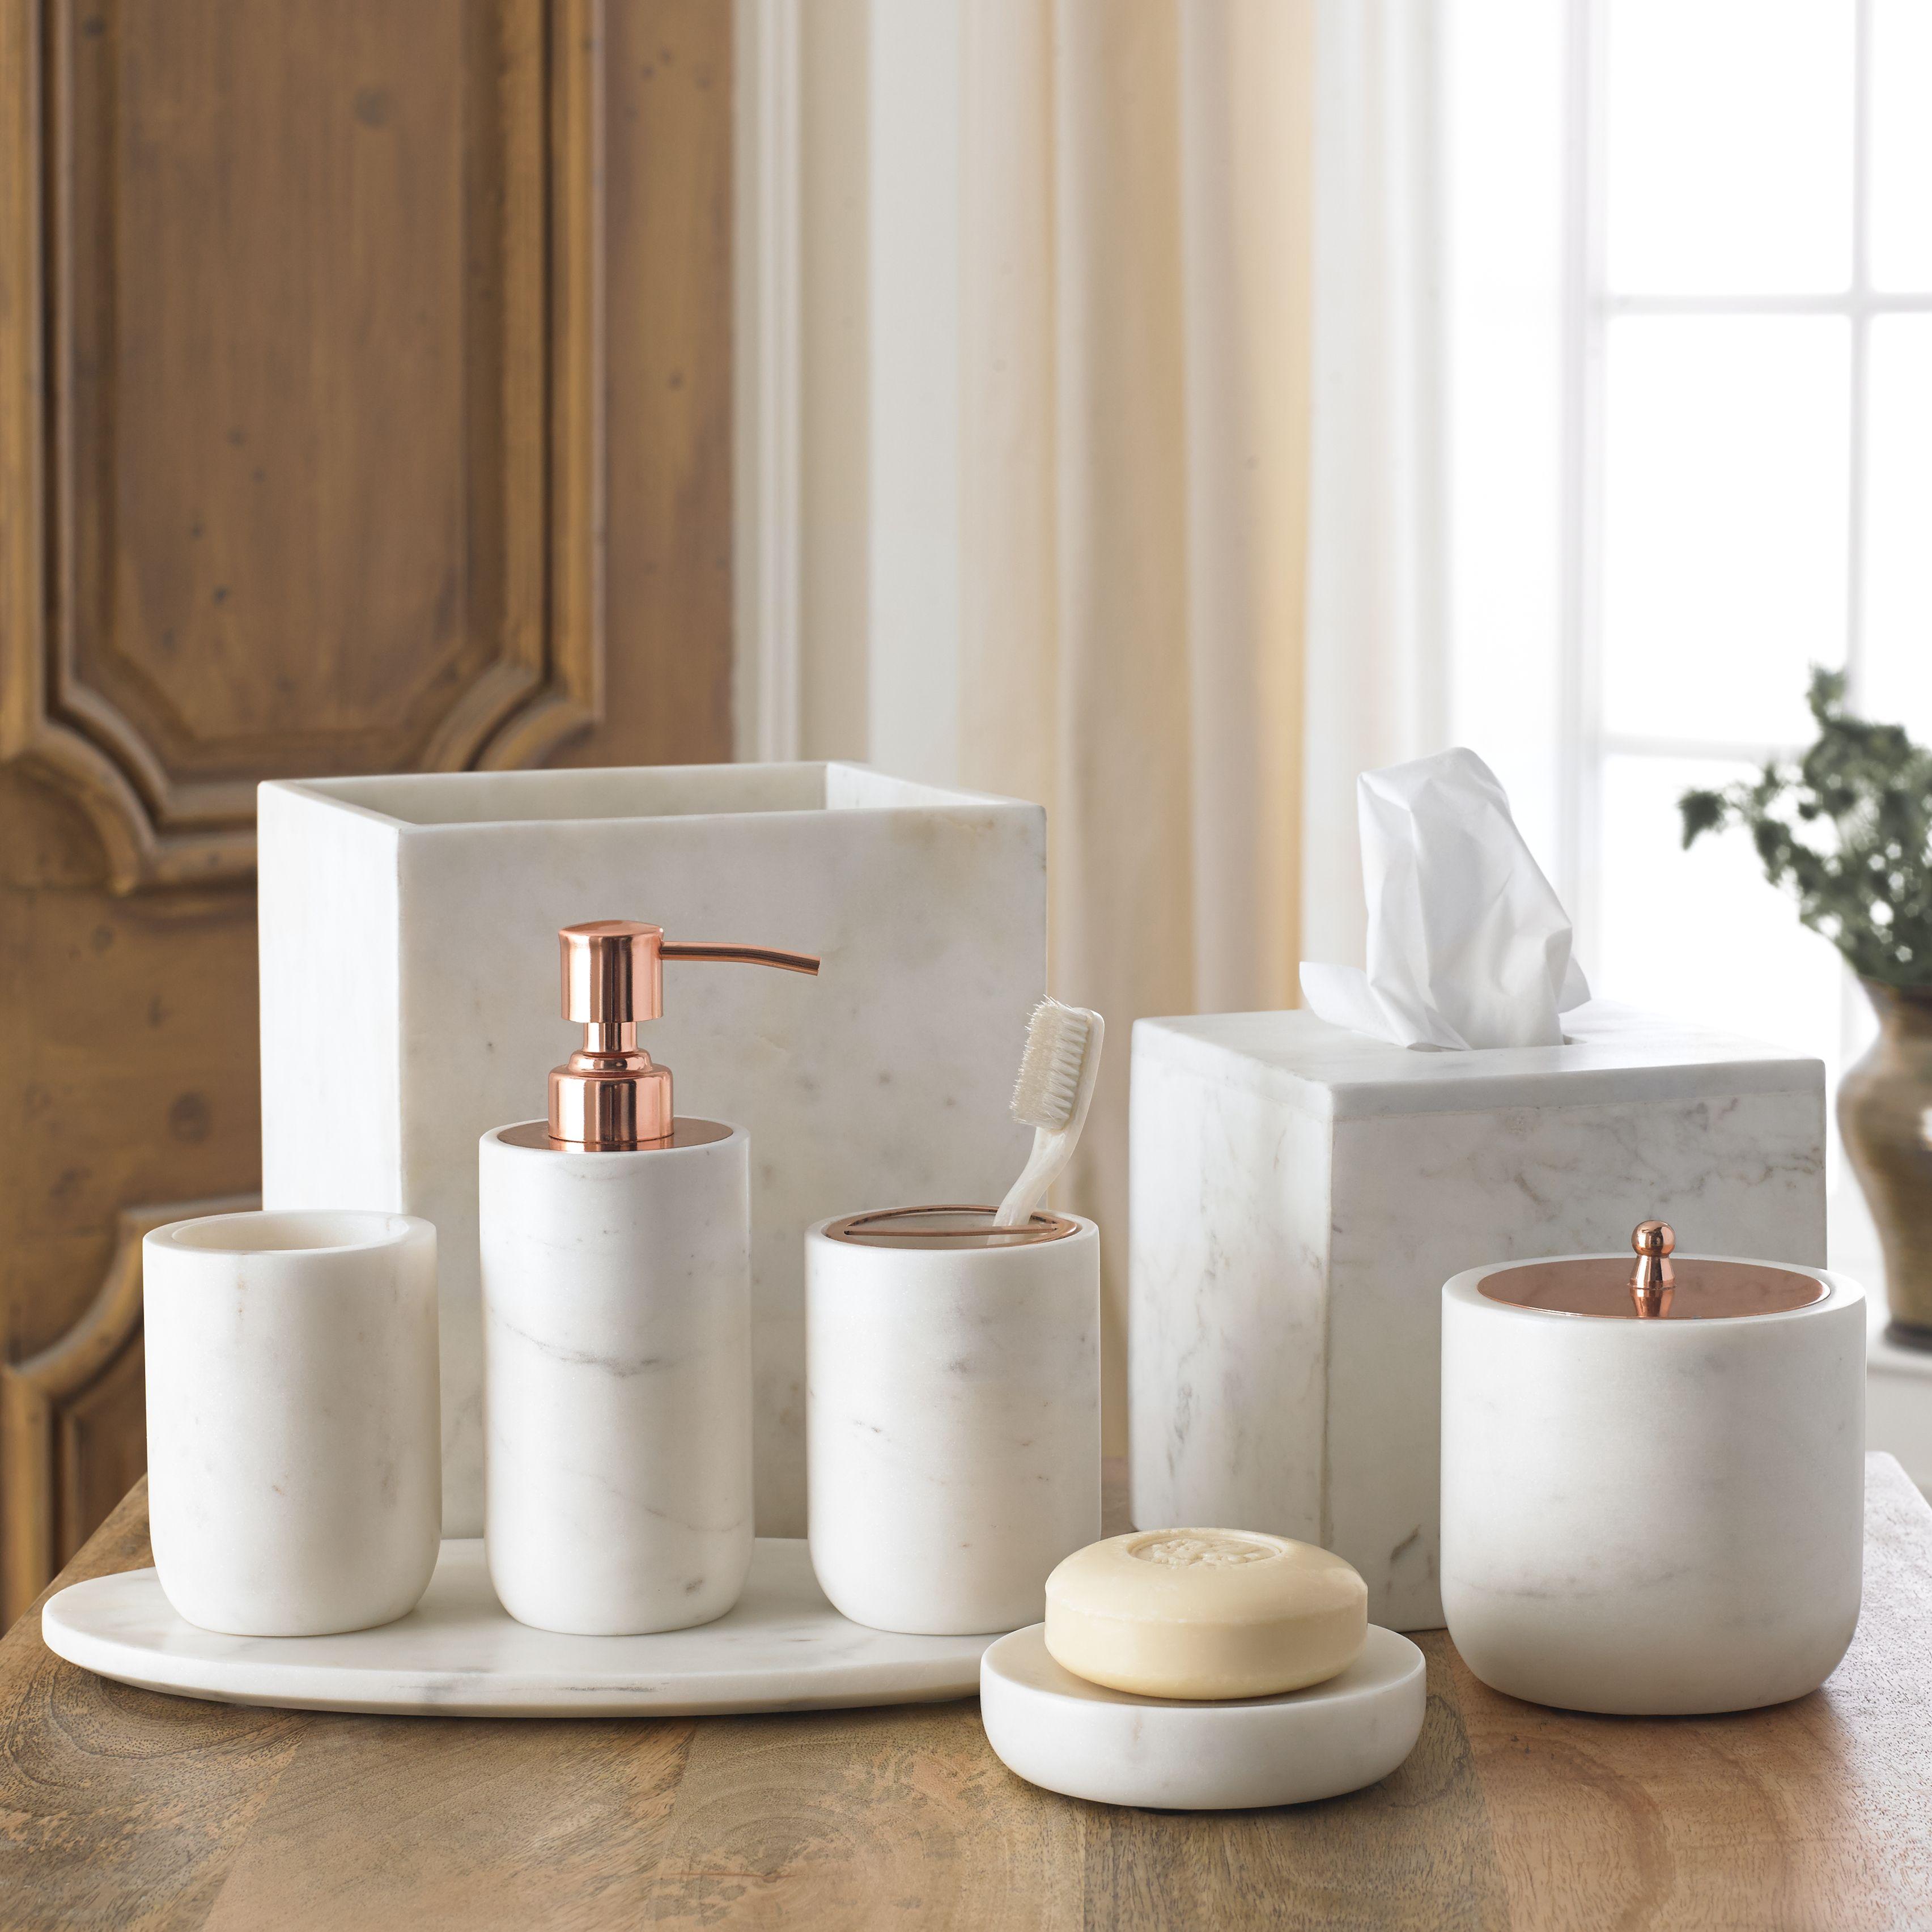 Marble Bath Accessories Badezimmer Accessoires Kupfer Badezimmer Luxus Badezimmer